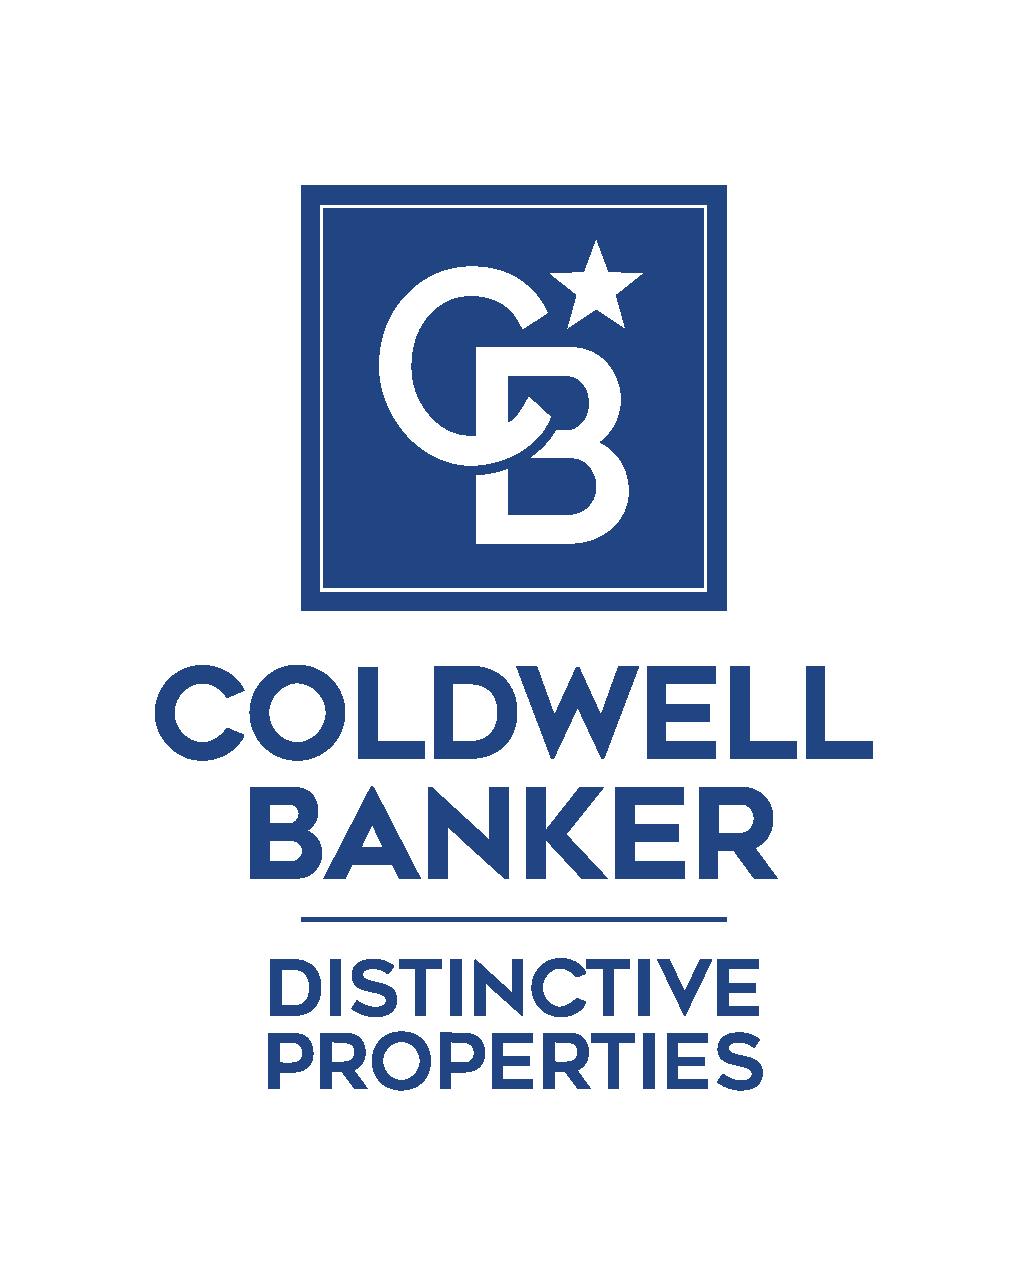 BOBBIE CARLL - Coldwell Banker Distinctive Properties Logo